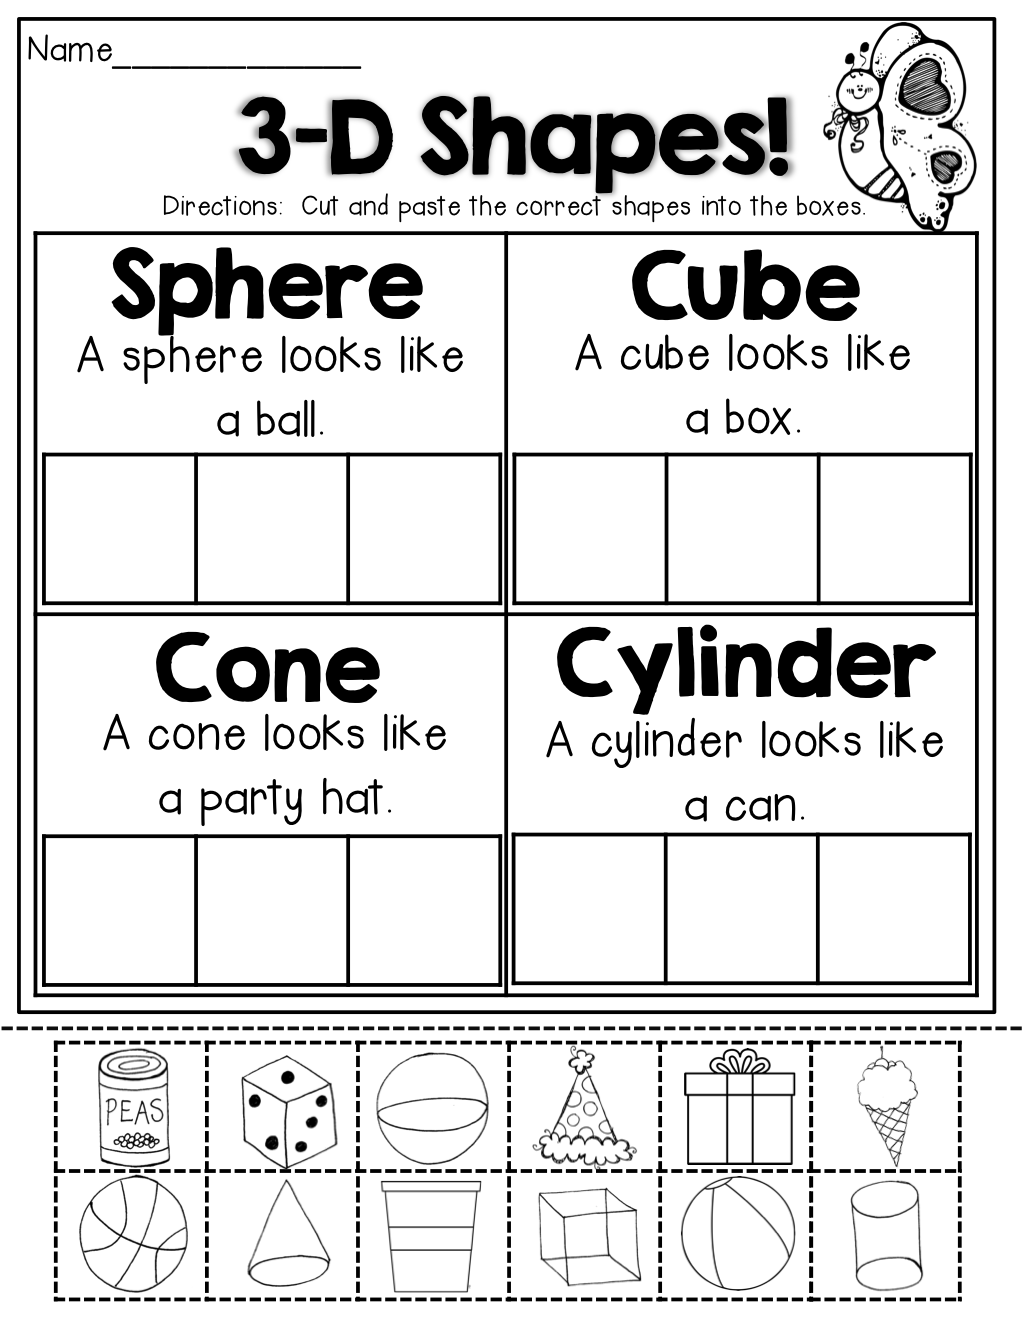 3 D Shapes Tons Of Great Printables That Hit Core Skills Shapes Worksheet Kindergarten Spring Math Kindergarten Math [ 1325 x 1024 Pixel ]